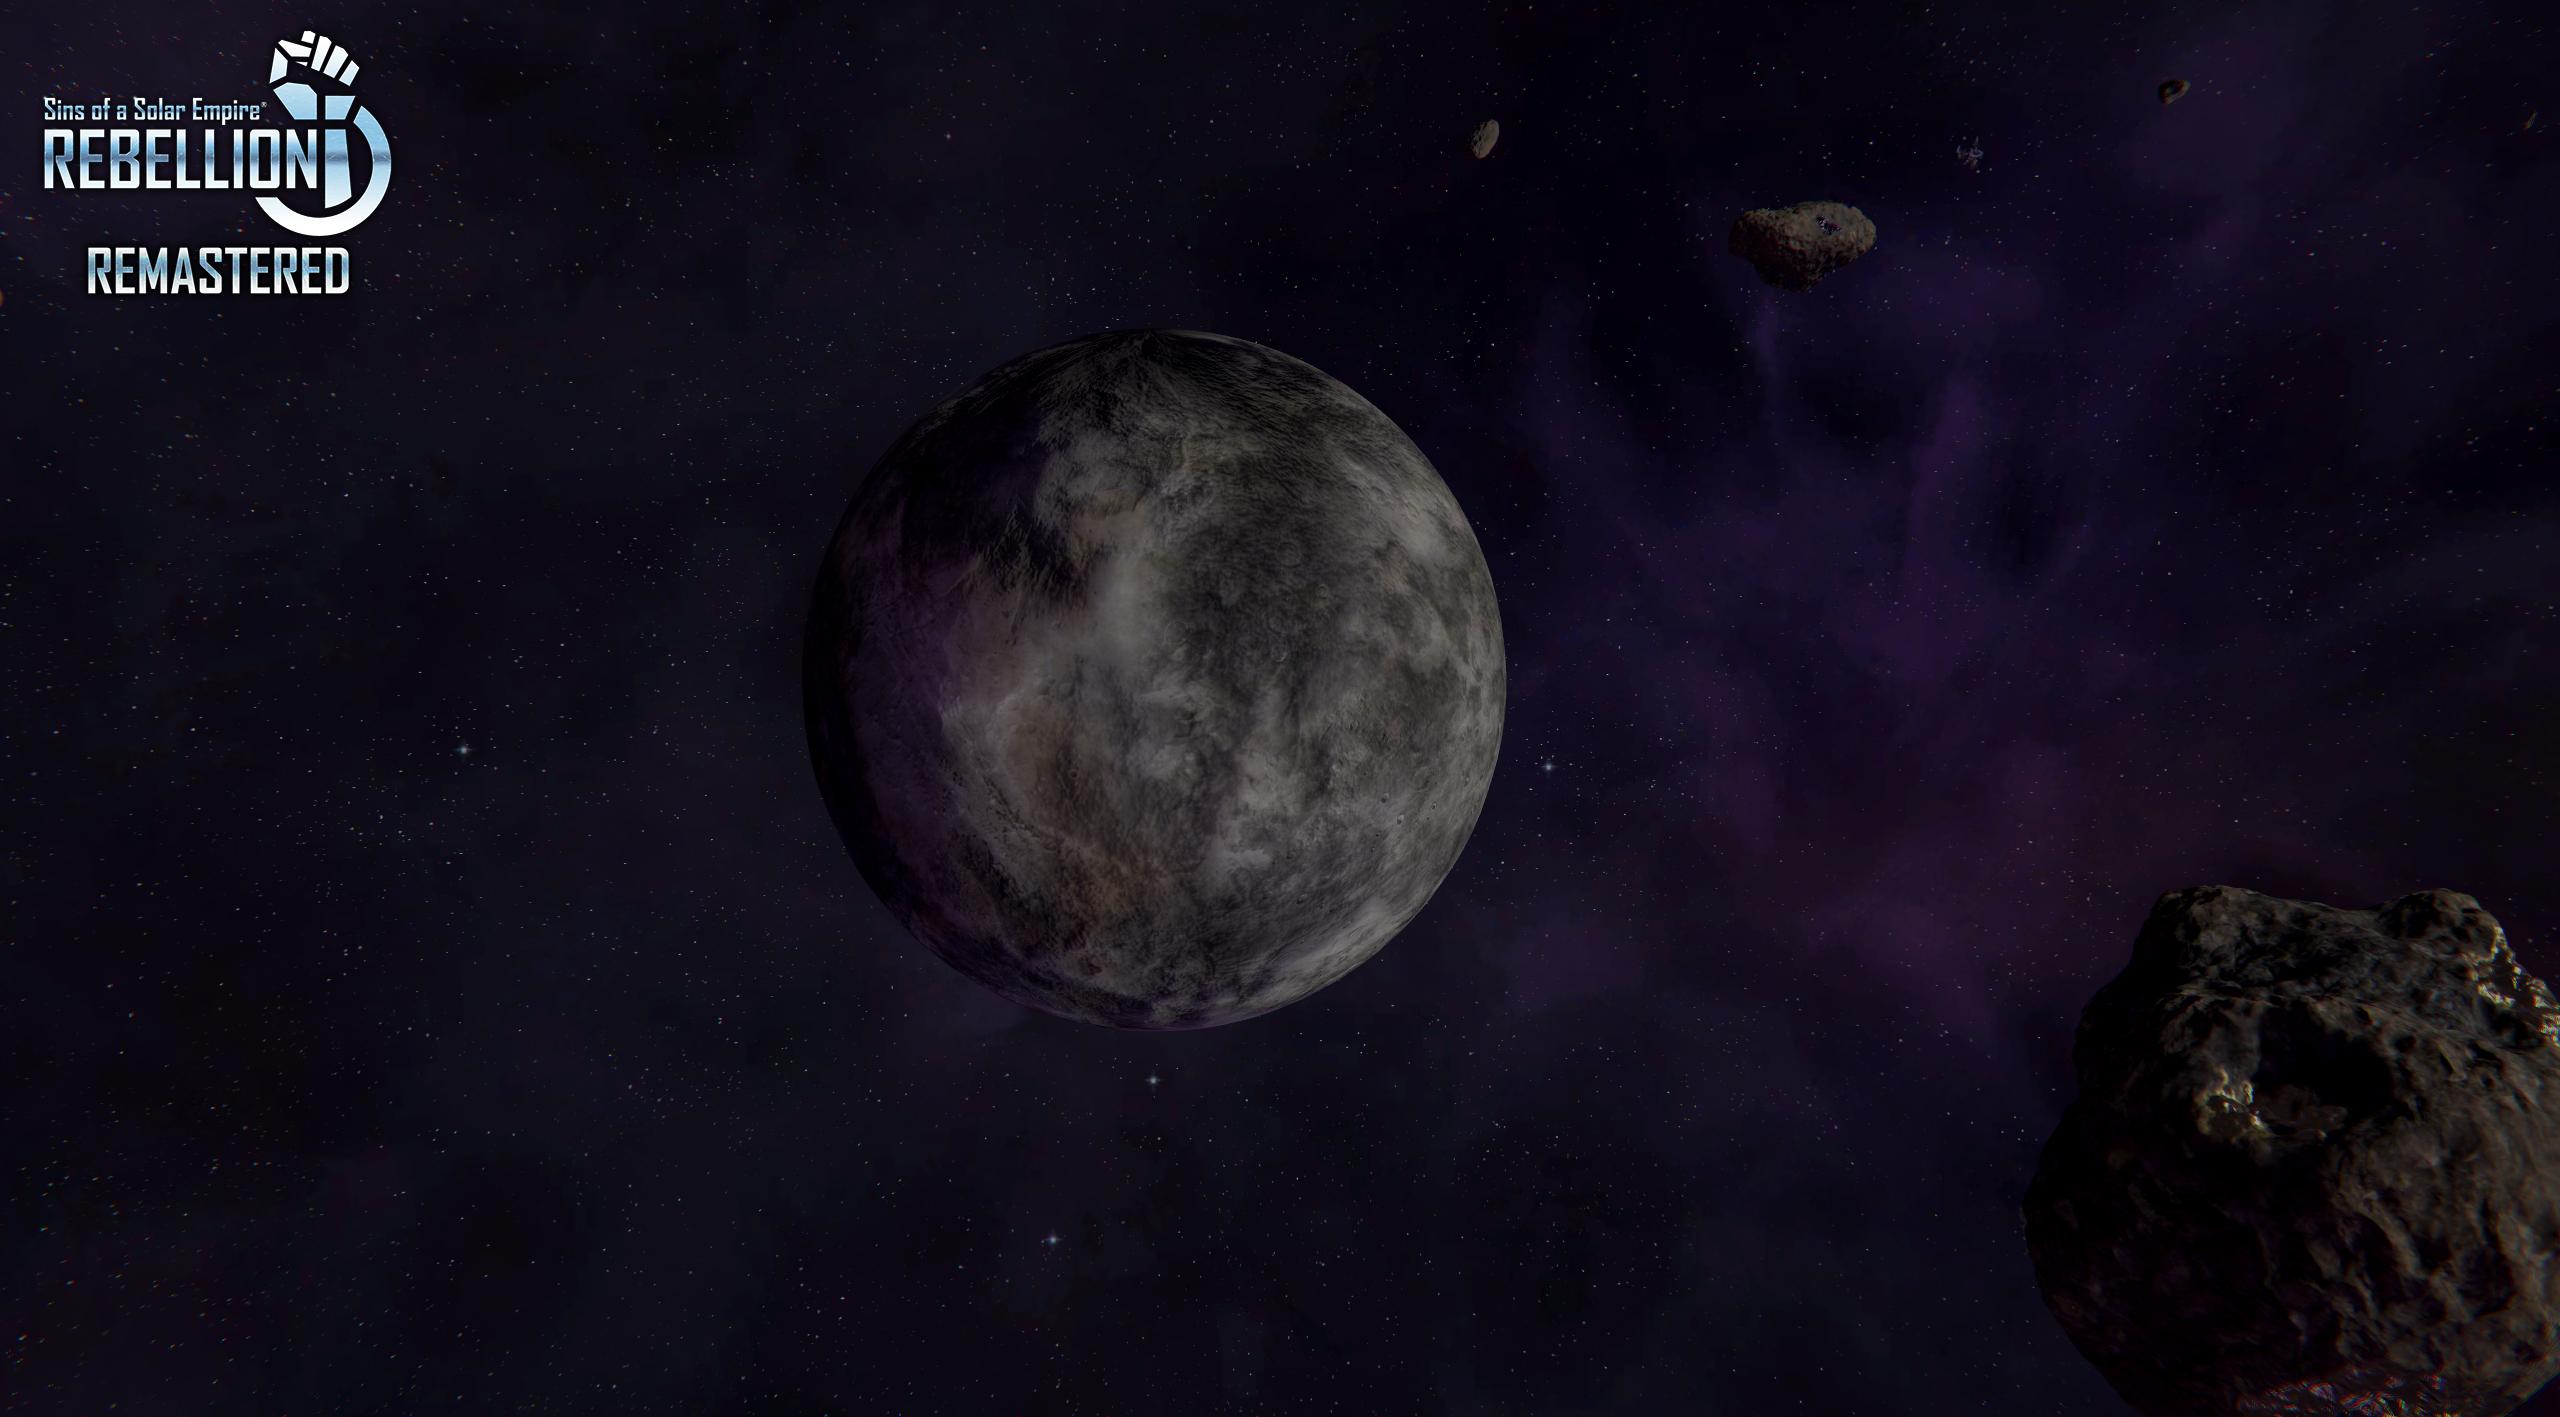 Planet Dwarf0 1